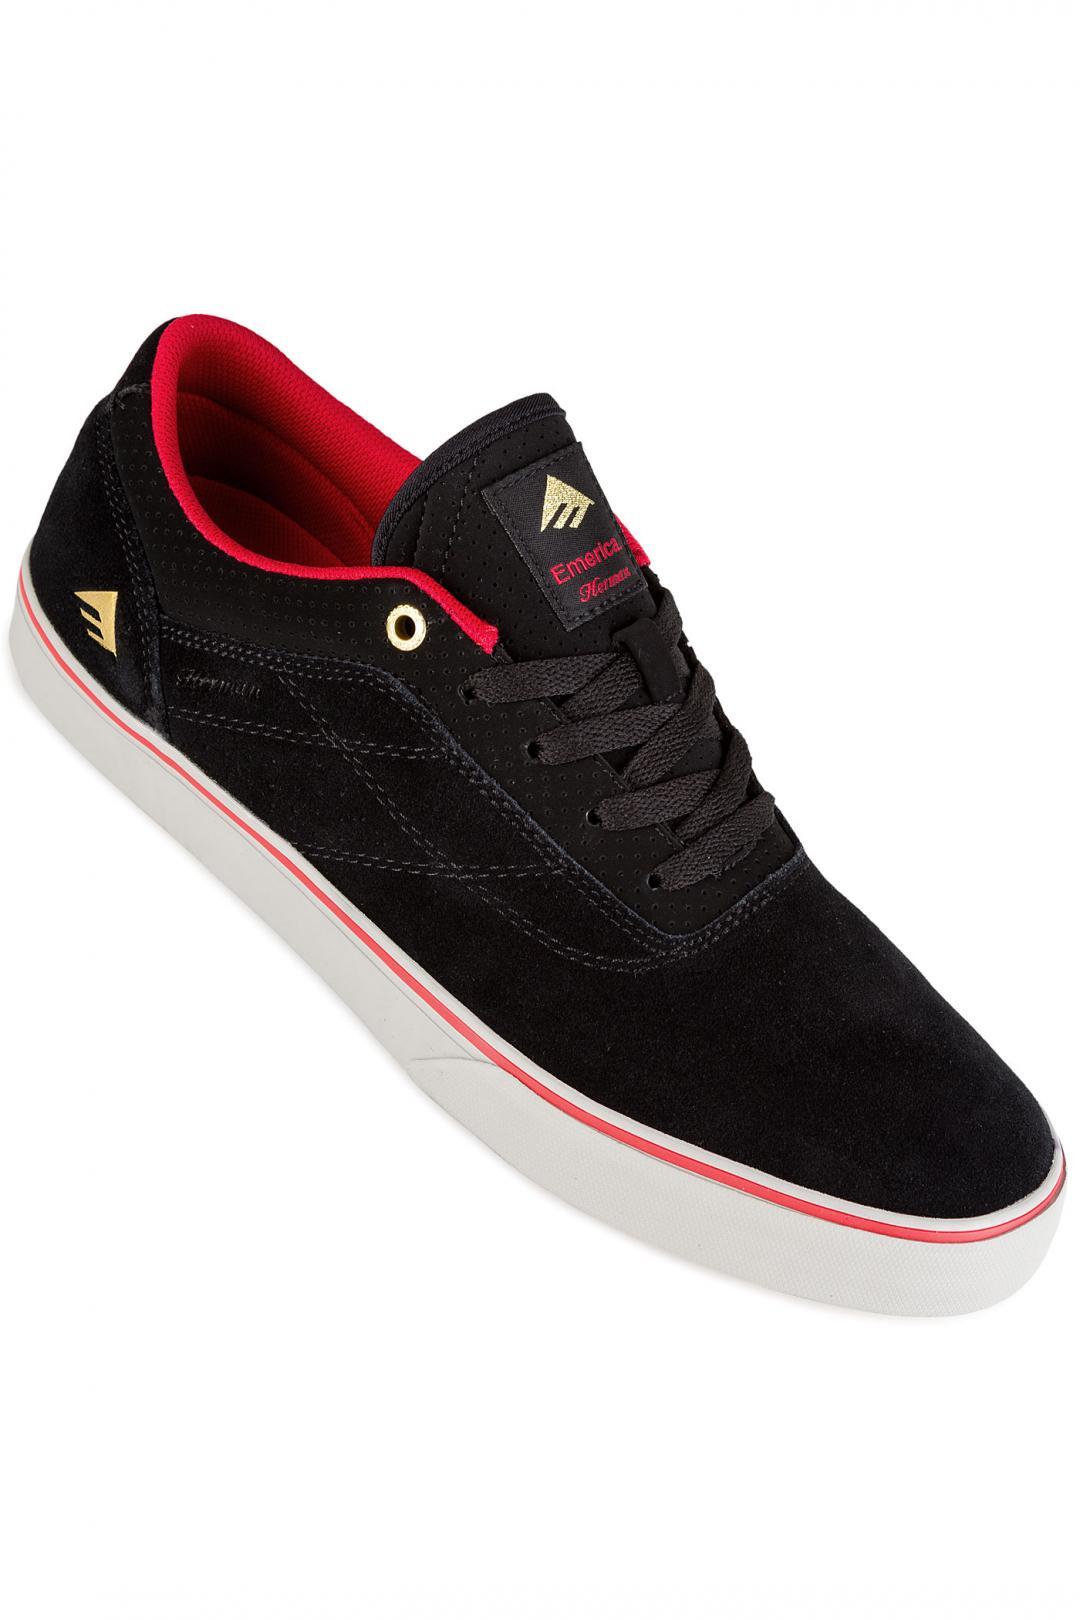 Uomo Emerica The Herman G6 Vulc black red grey   Sneakers low top